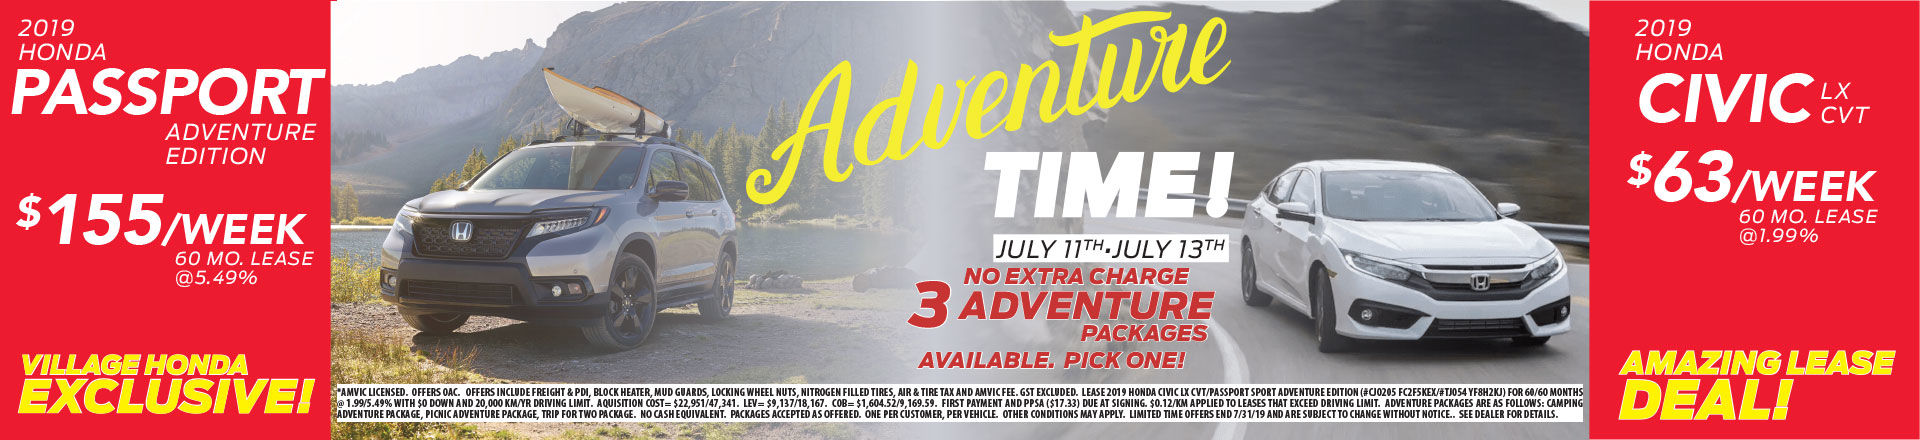 ADVENTURE EVENT